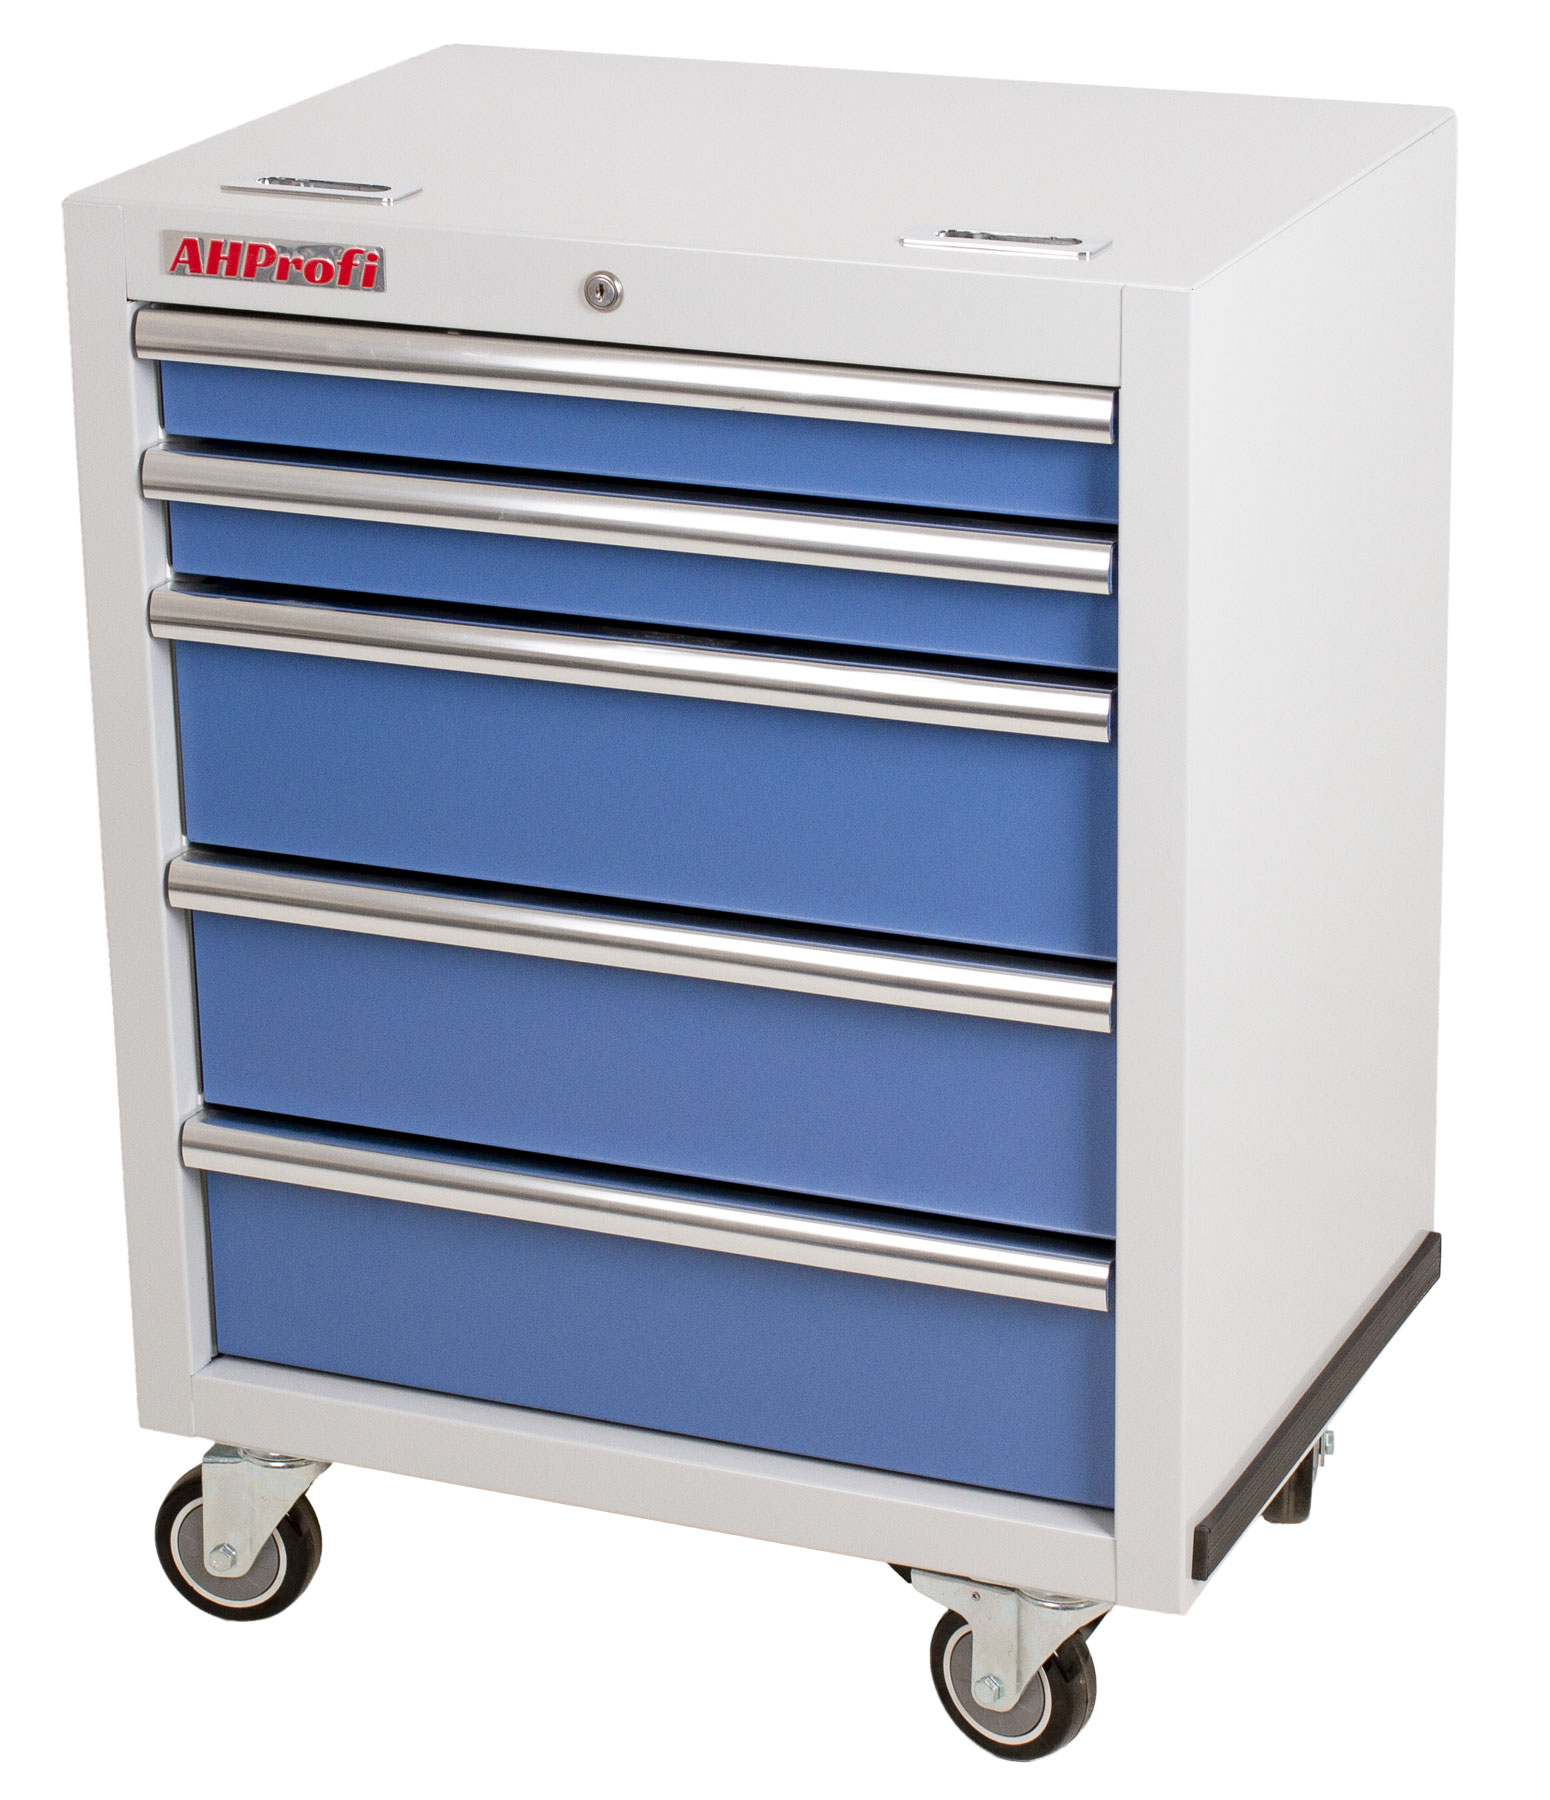 Dílenský vozík na nářadí PROFI, 5 zásuvek, modrá - MTGC1305W